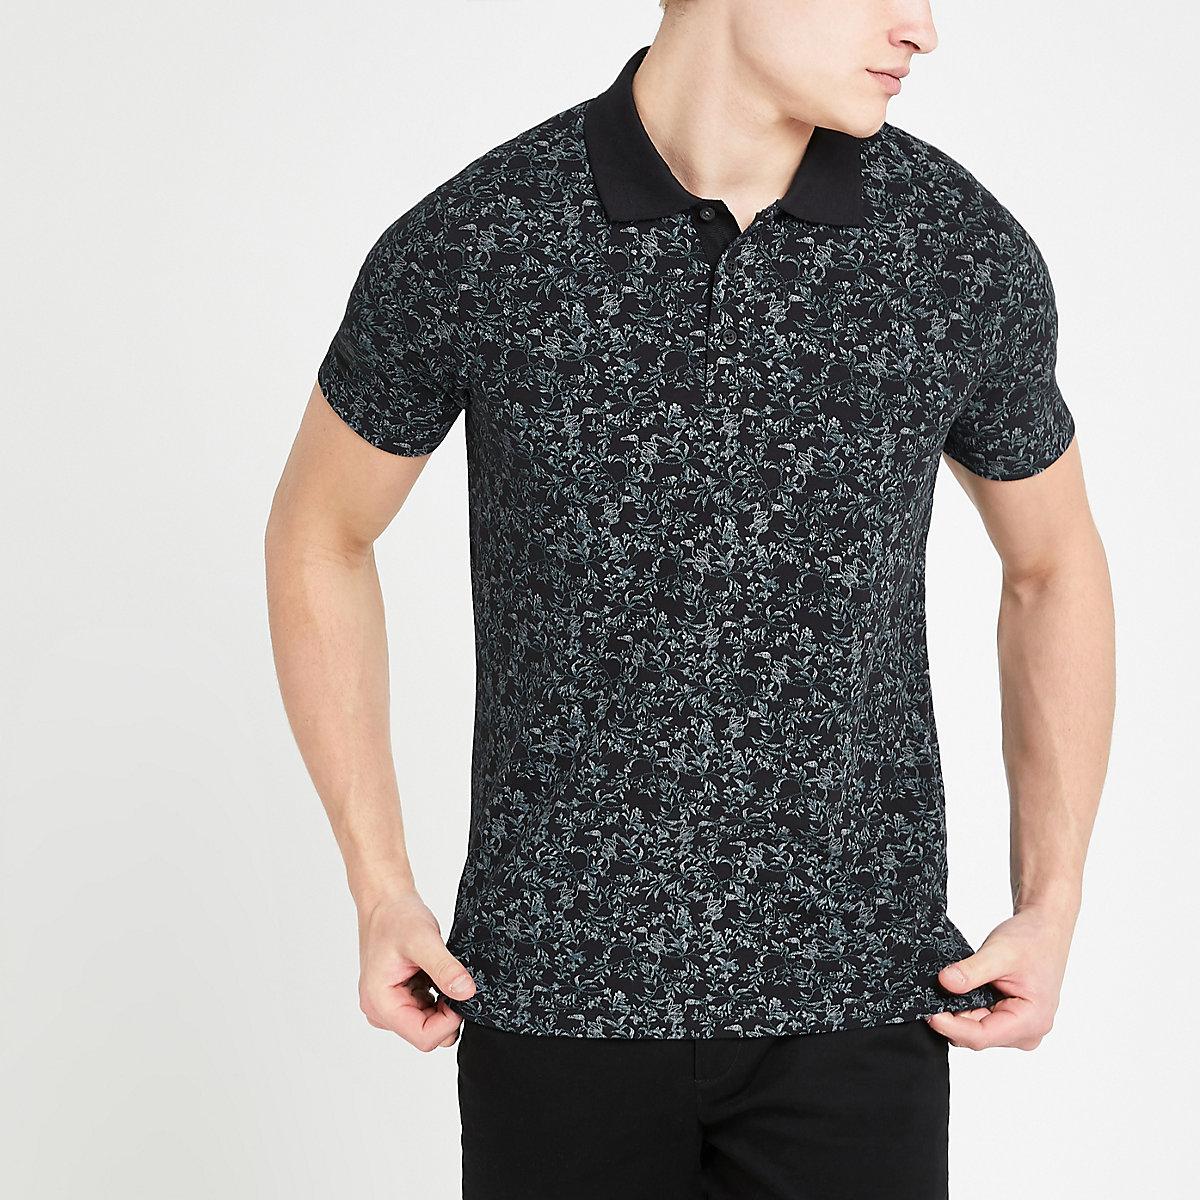 Jack and Jones black floral polo shirt